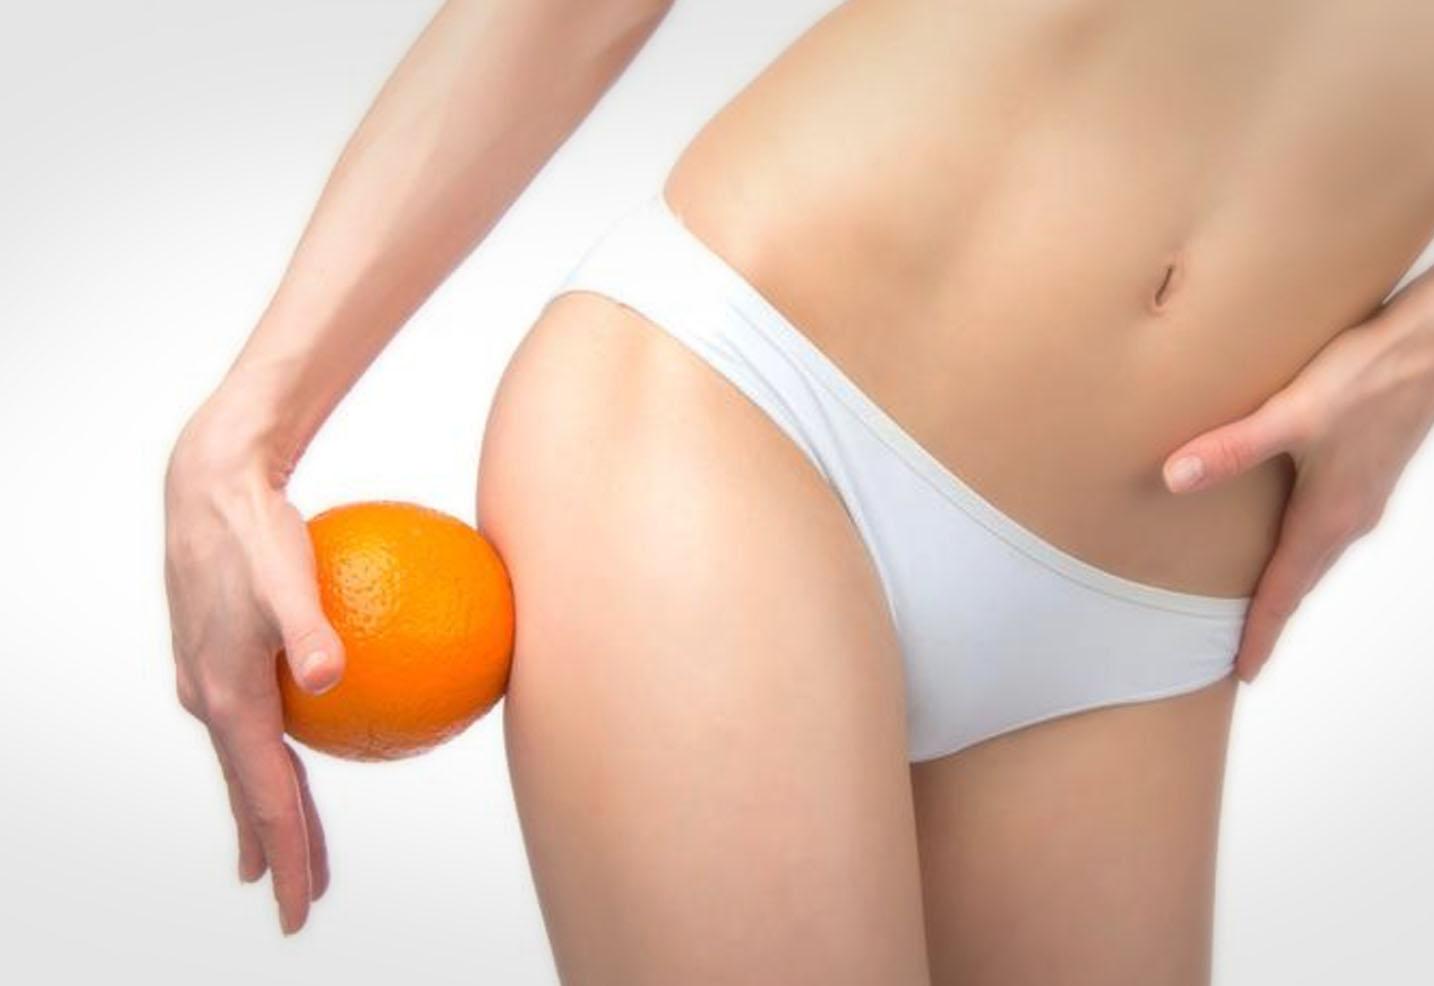 Tratamiento celulitis, como eliminarla